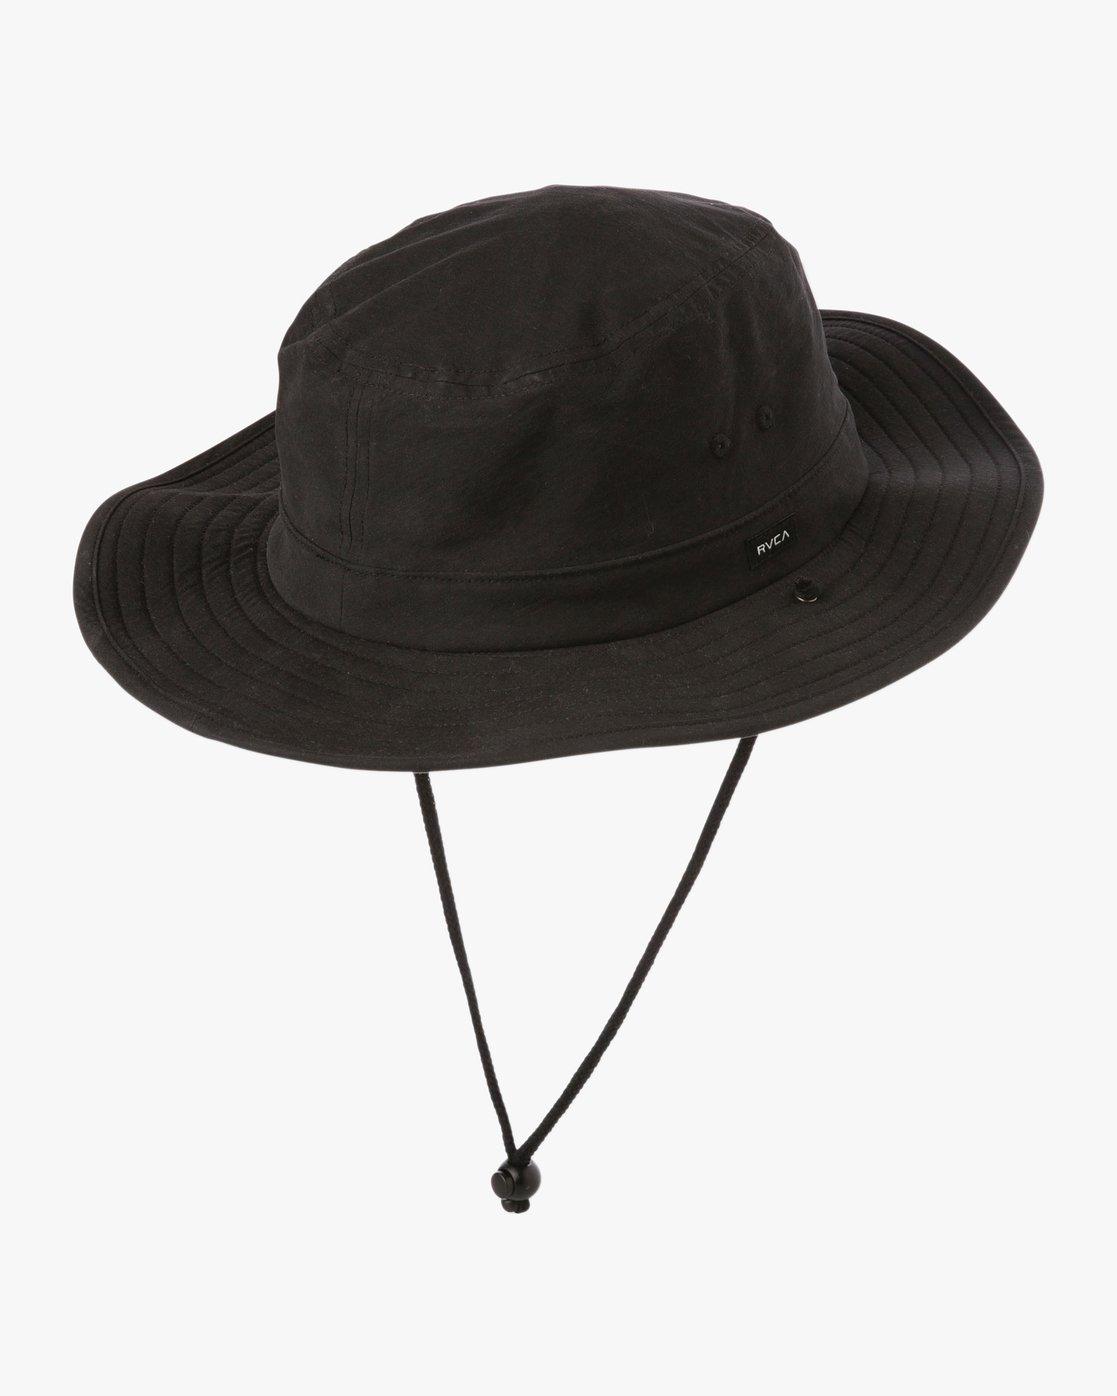 8af3ef2c471ee2 0 Balance Boonie Hat MAHWTRBB RVCA